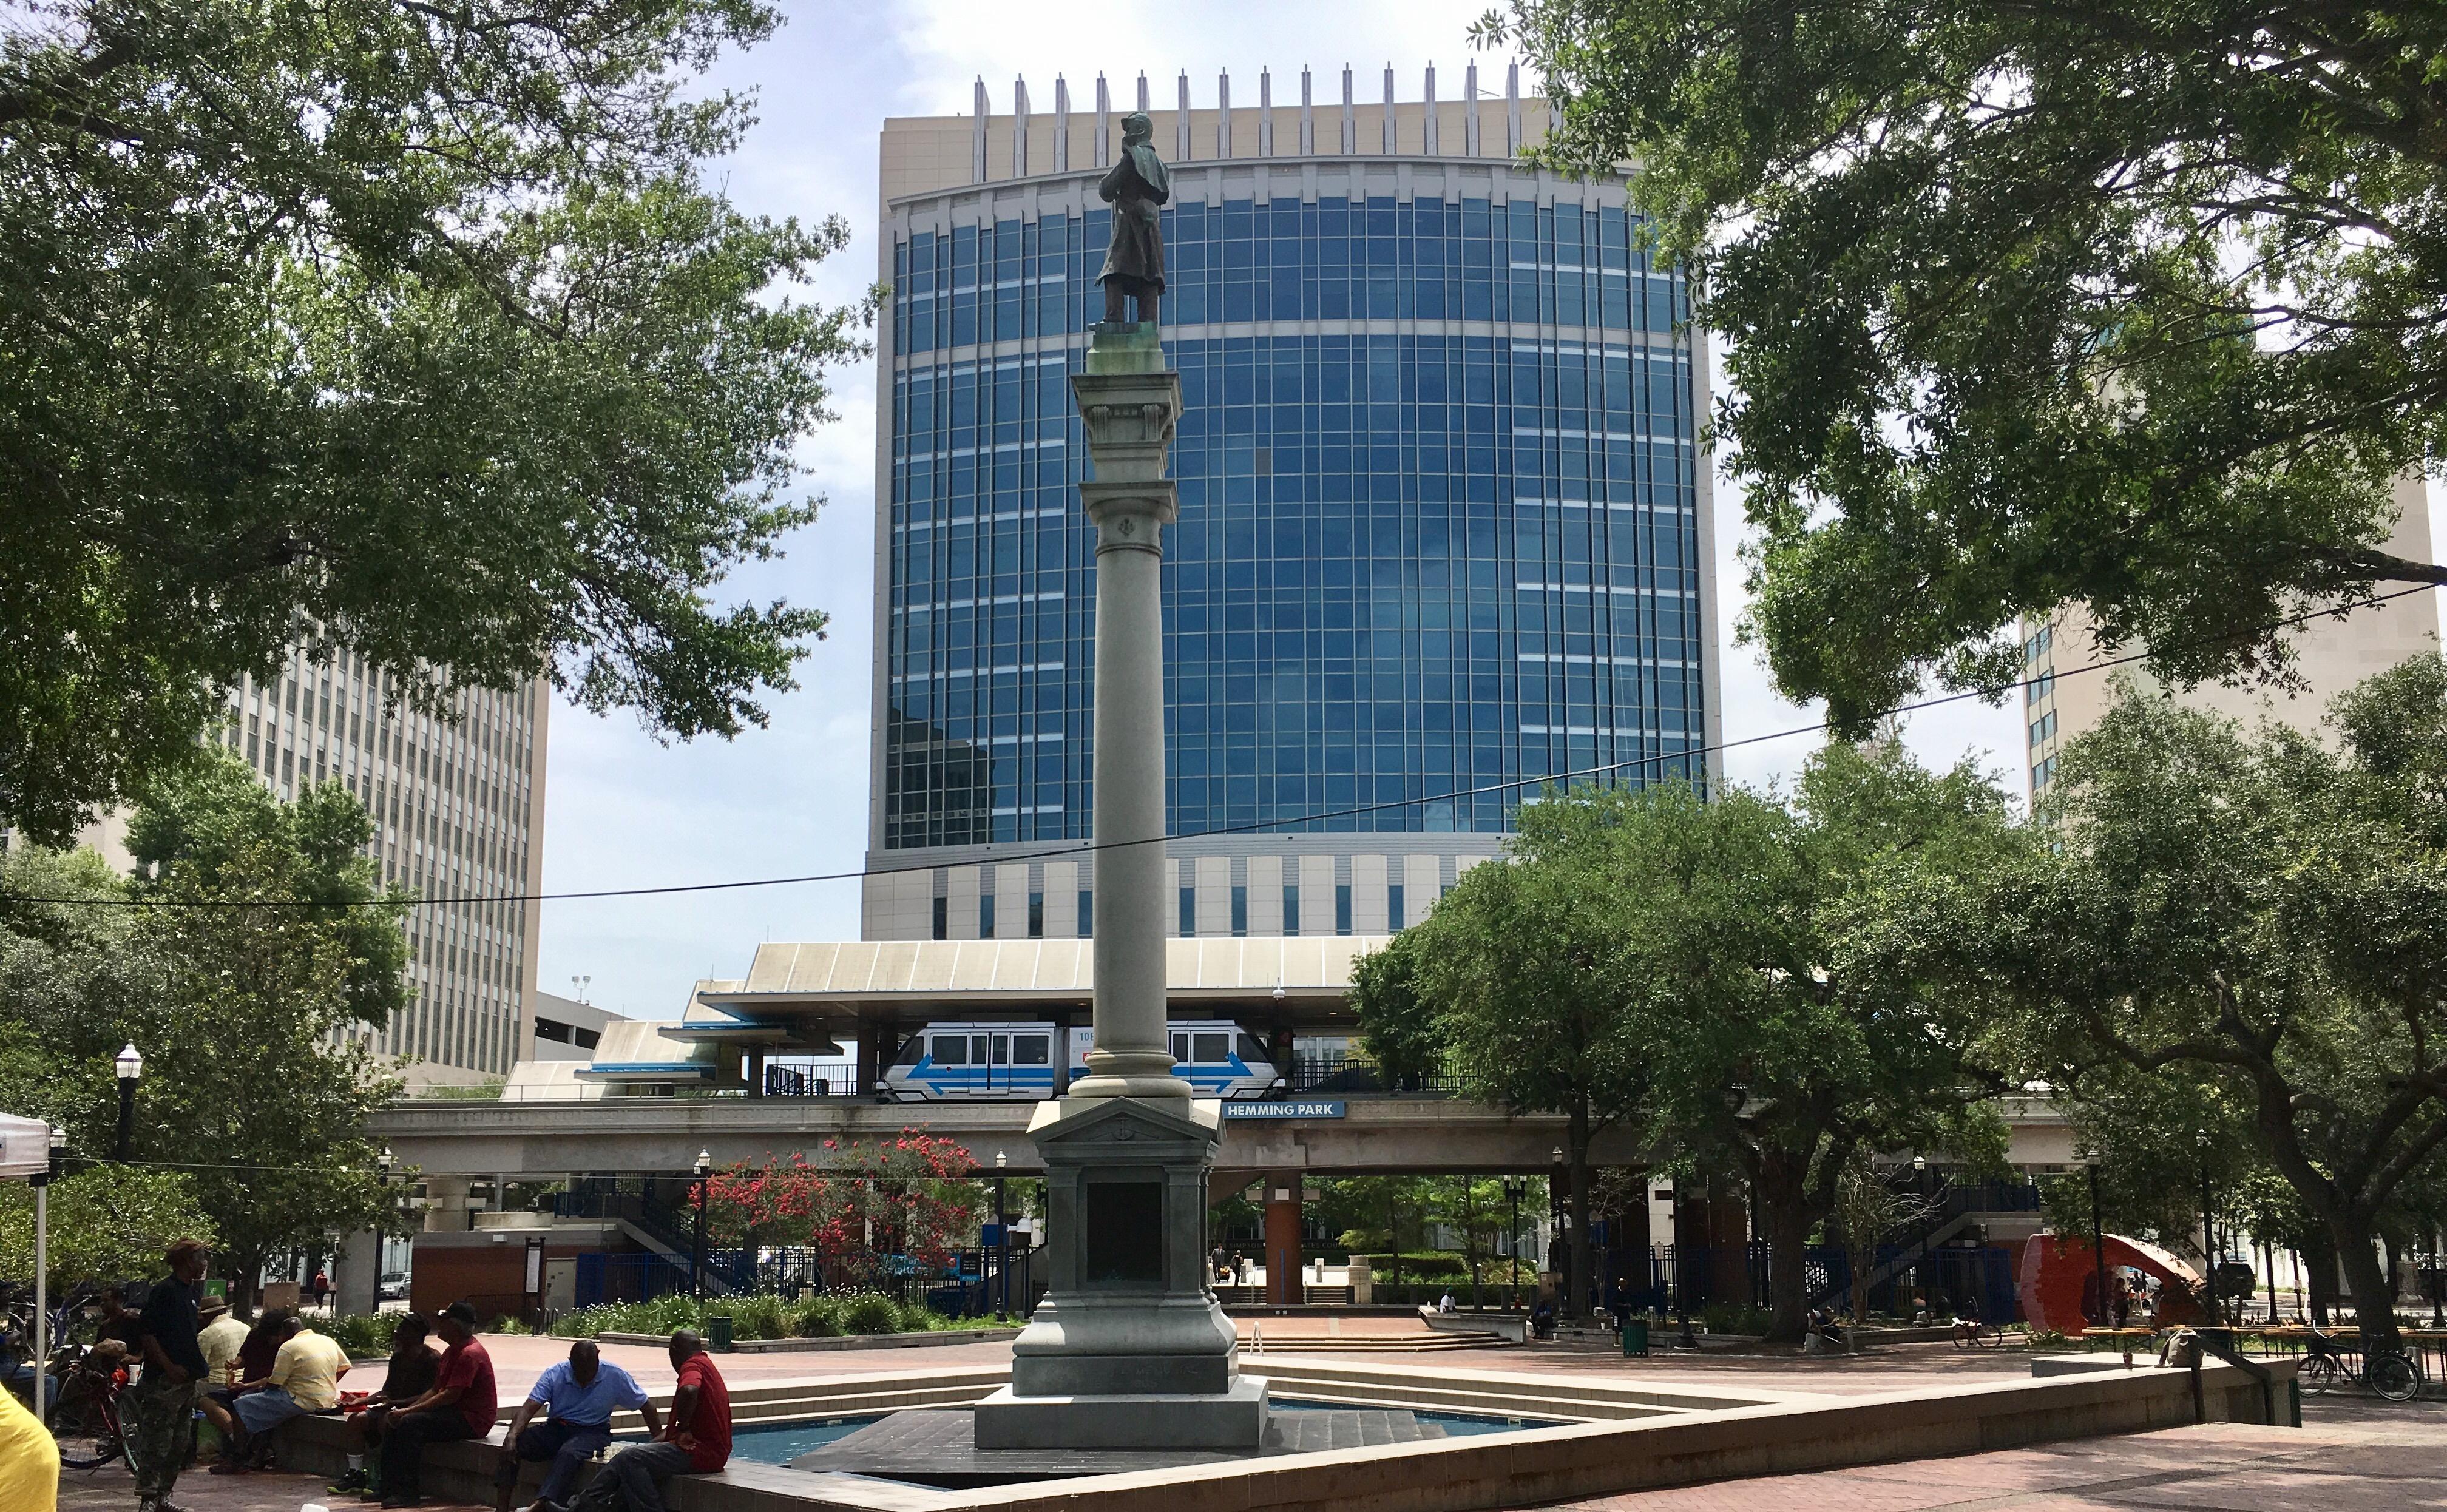 Confederate monument in Hemming Park